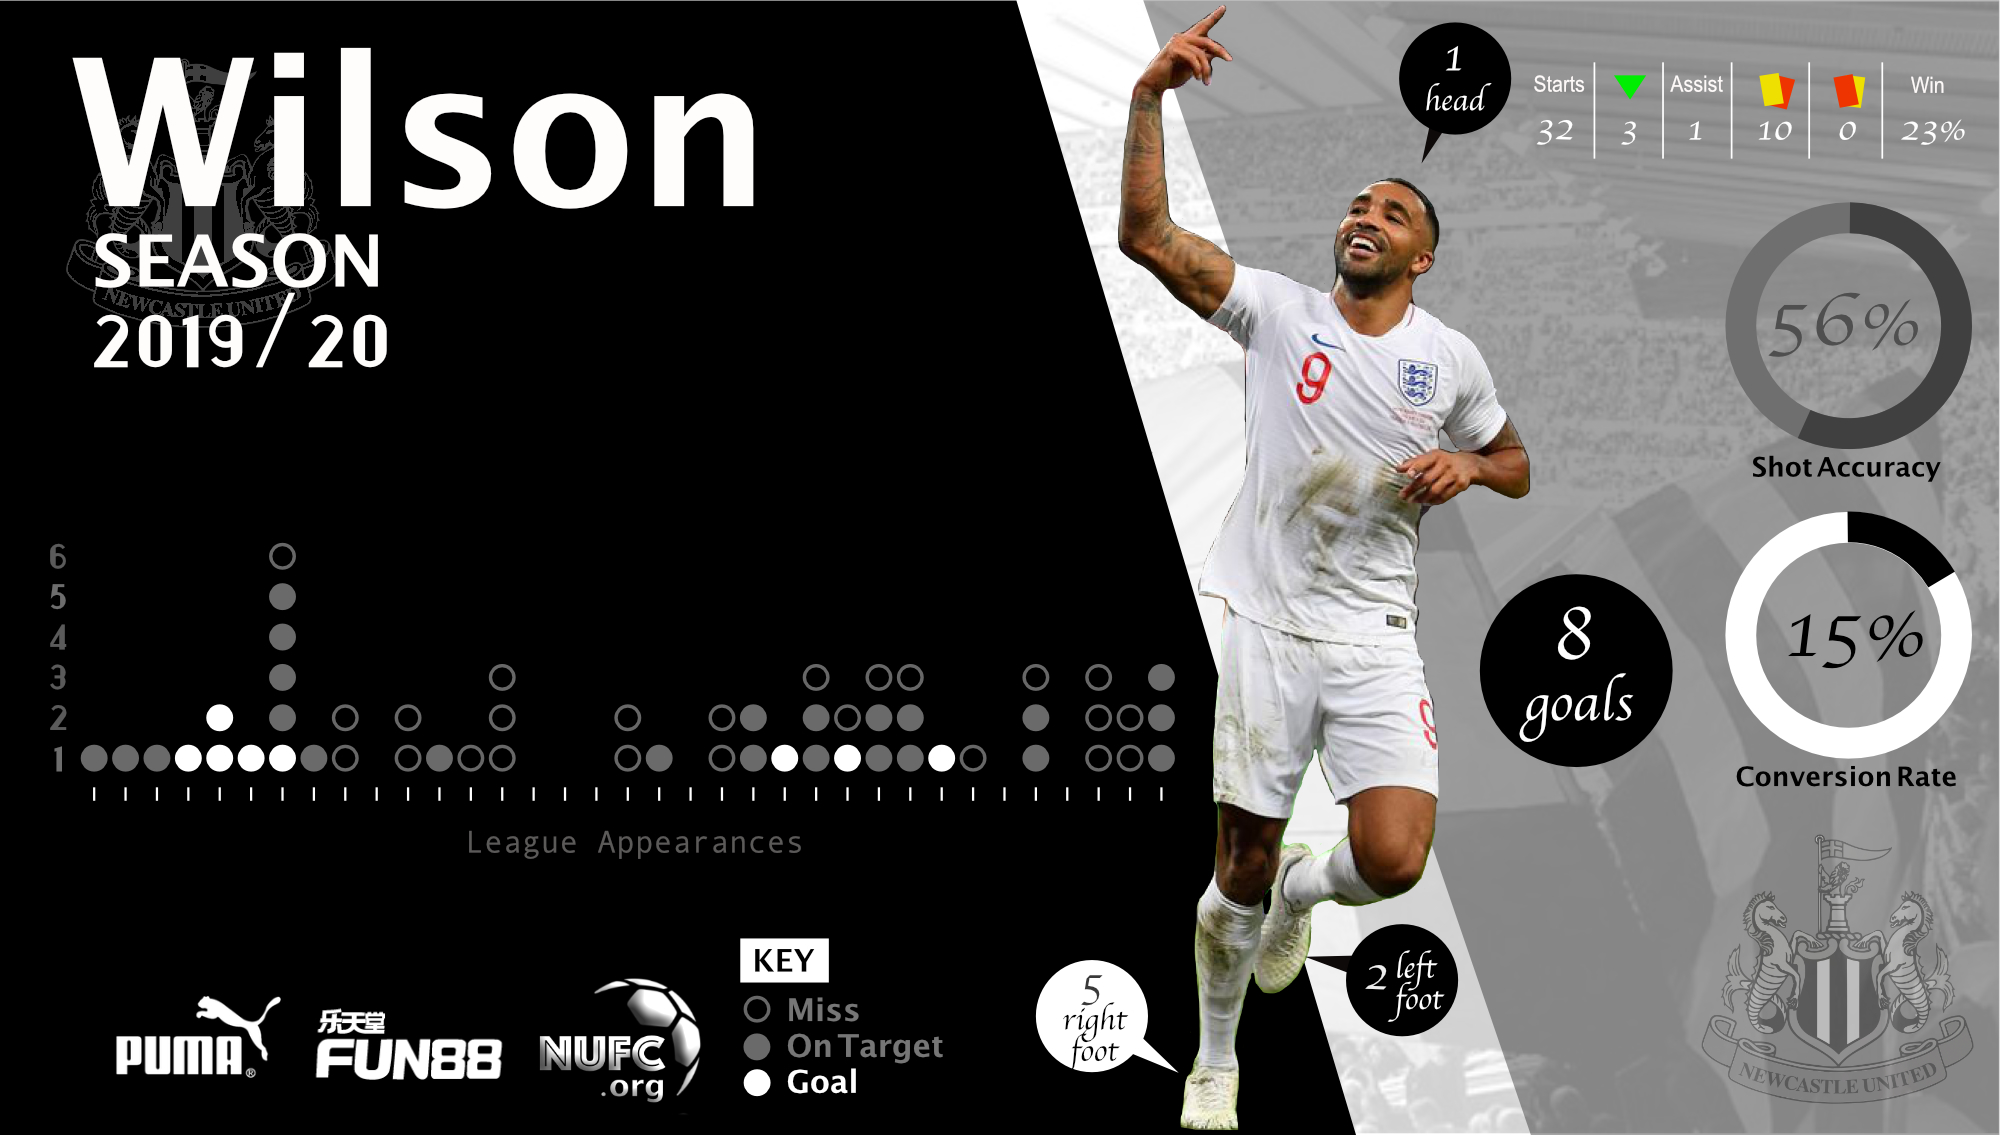 NUFC Infographic - Wilson